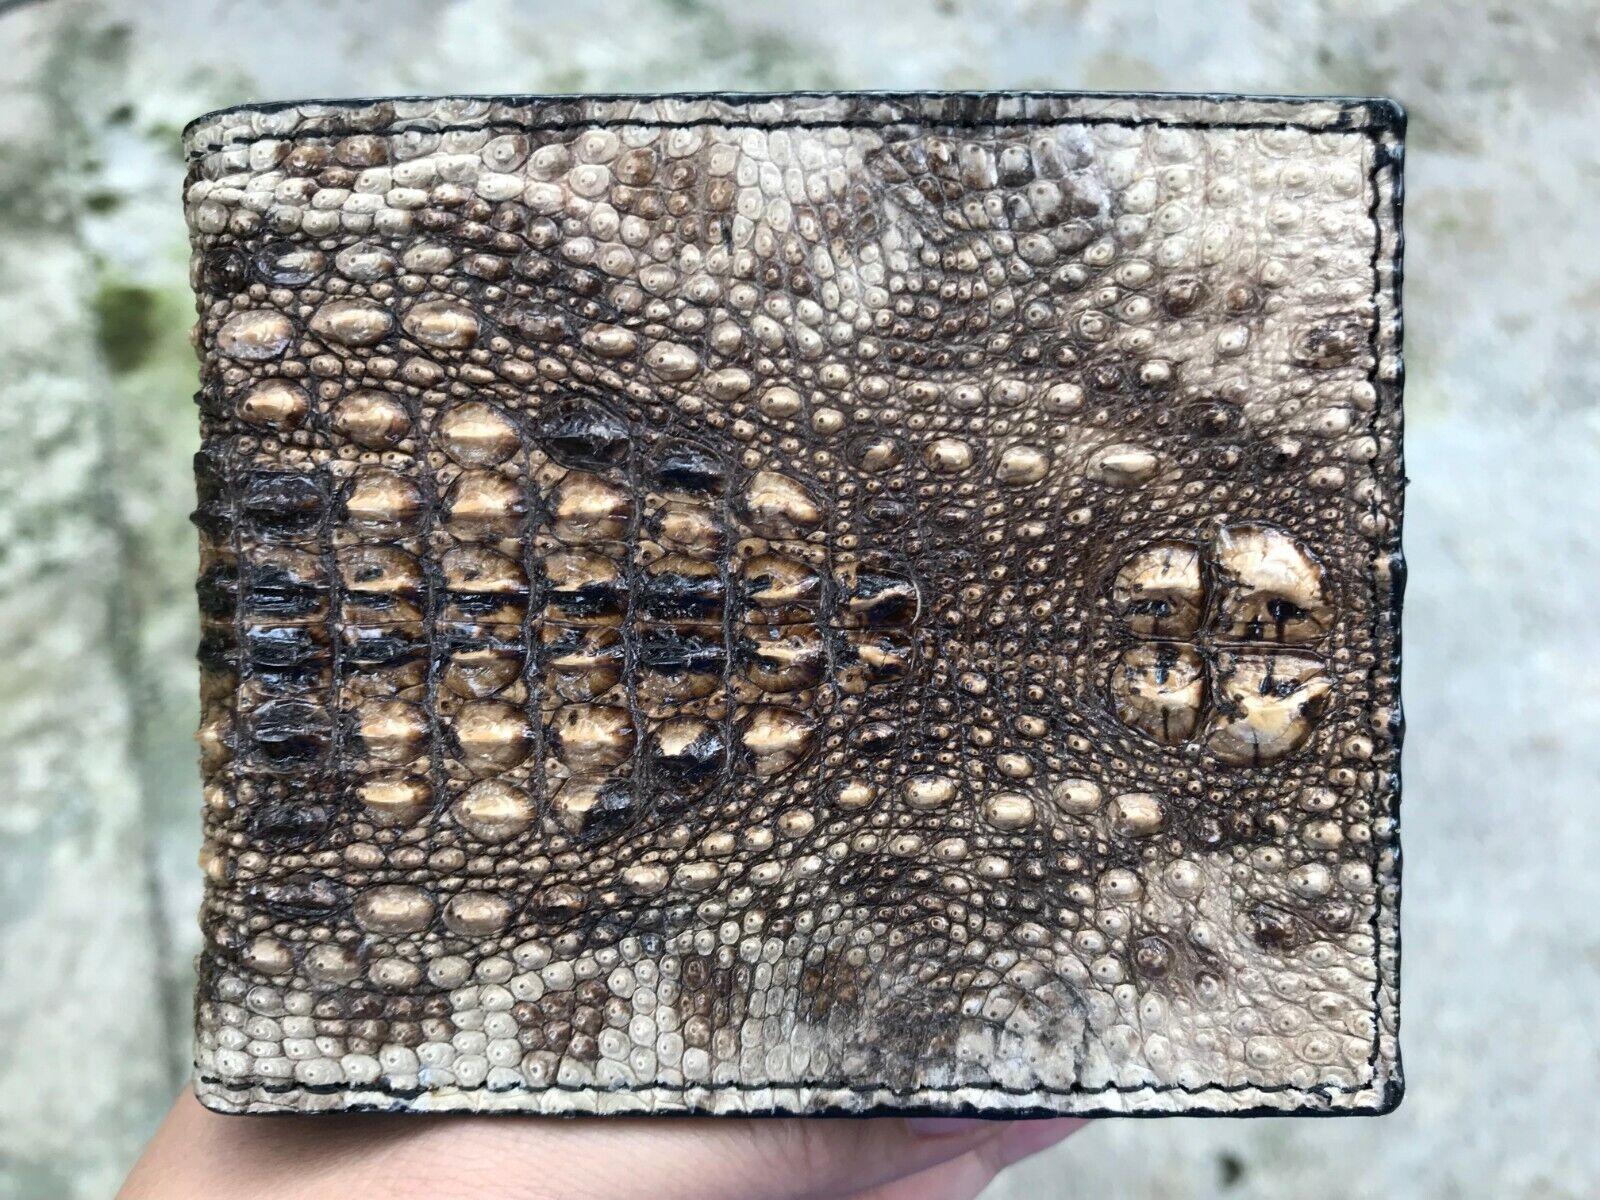 New Genuine Leather Crocodile Alligator Skin Men Bifold Wallet Handmade